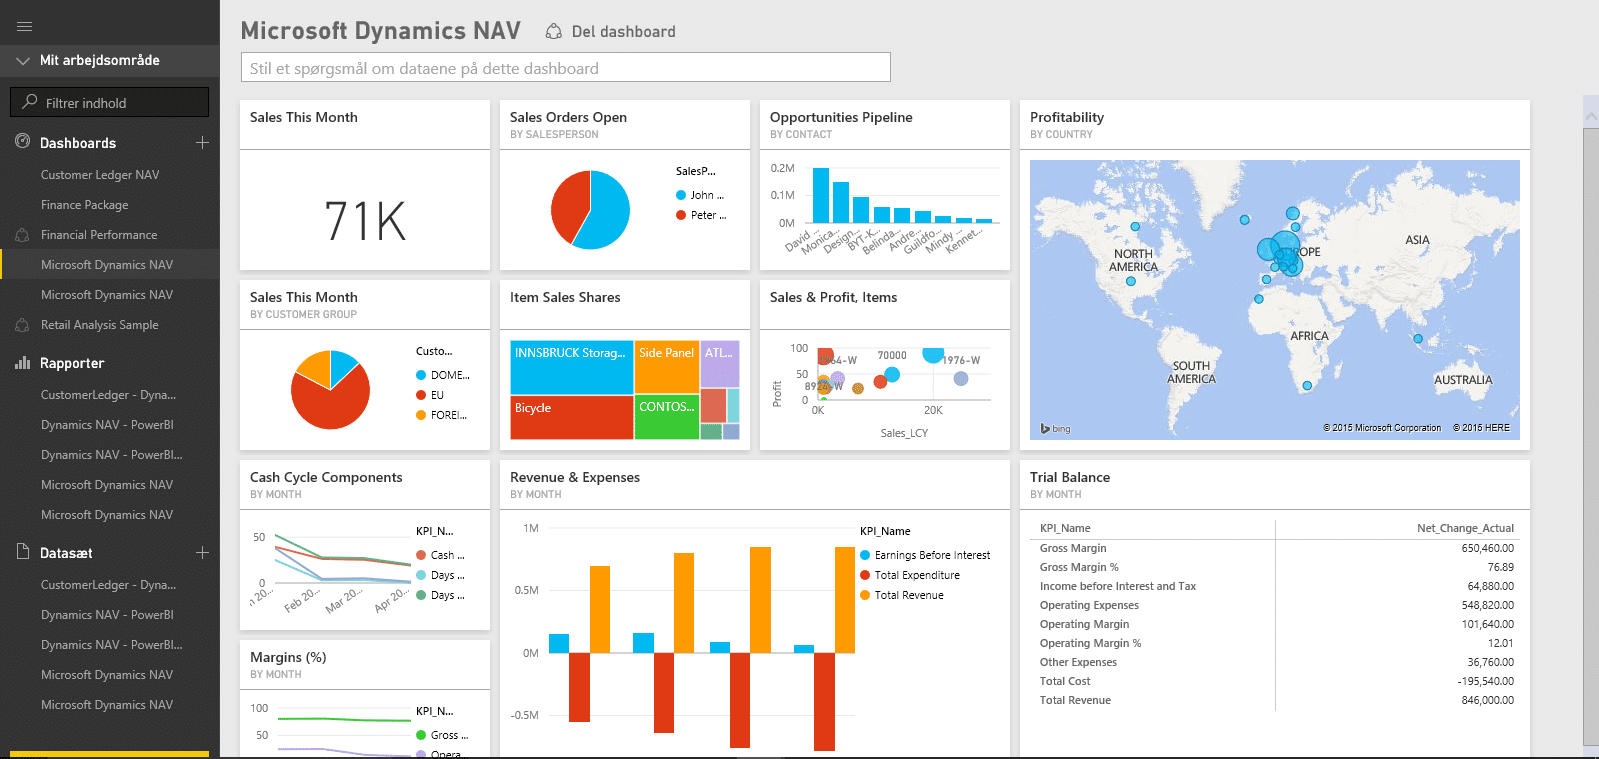 ARBENTIA Gold Partner Microsoft Dynamics NAV 2016 en Power BI